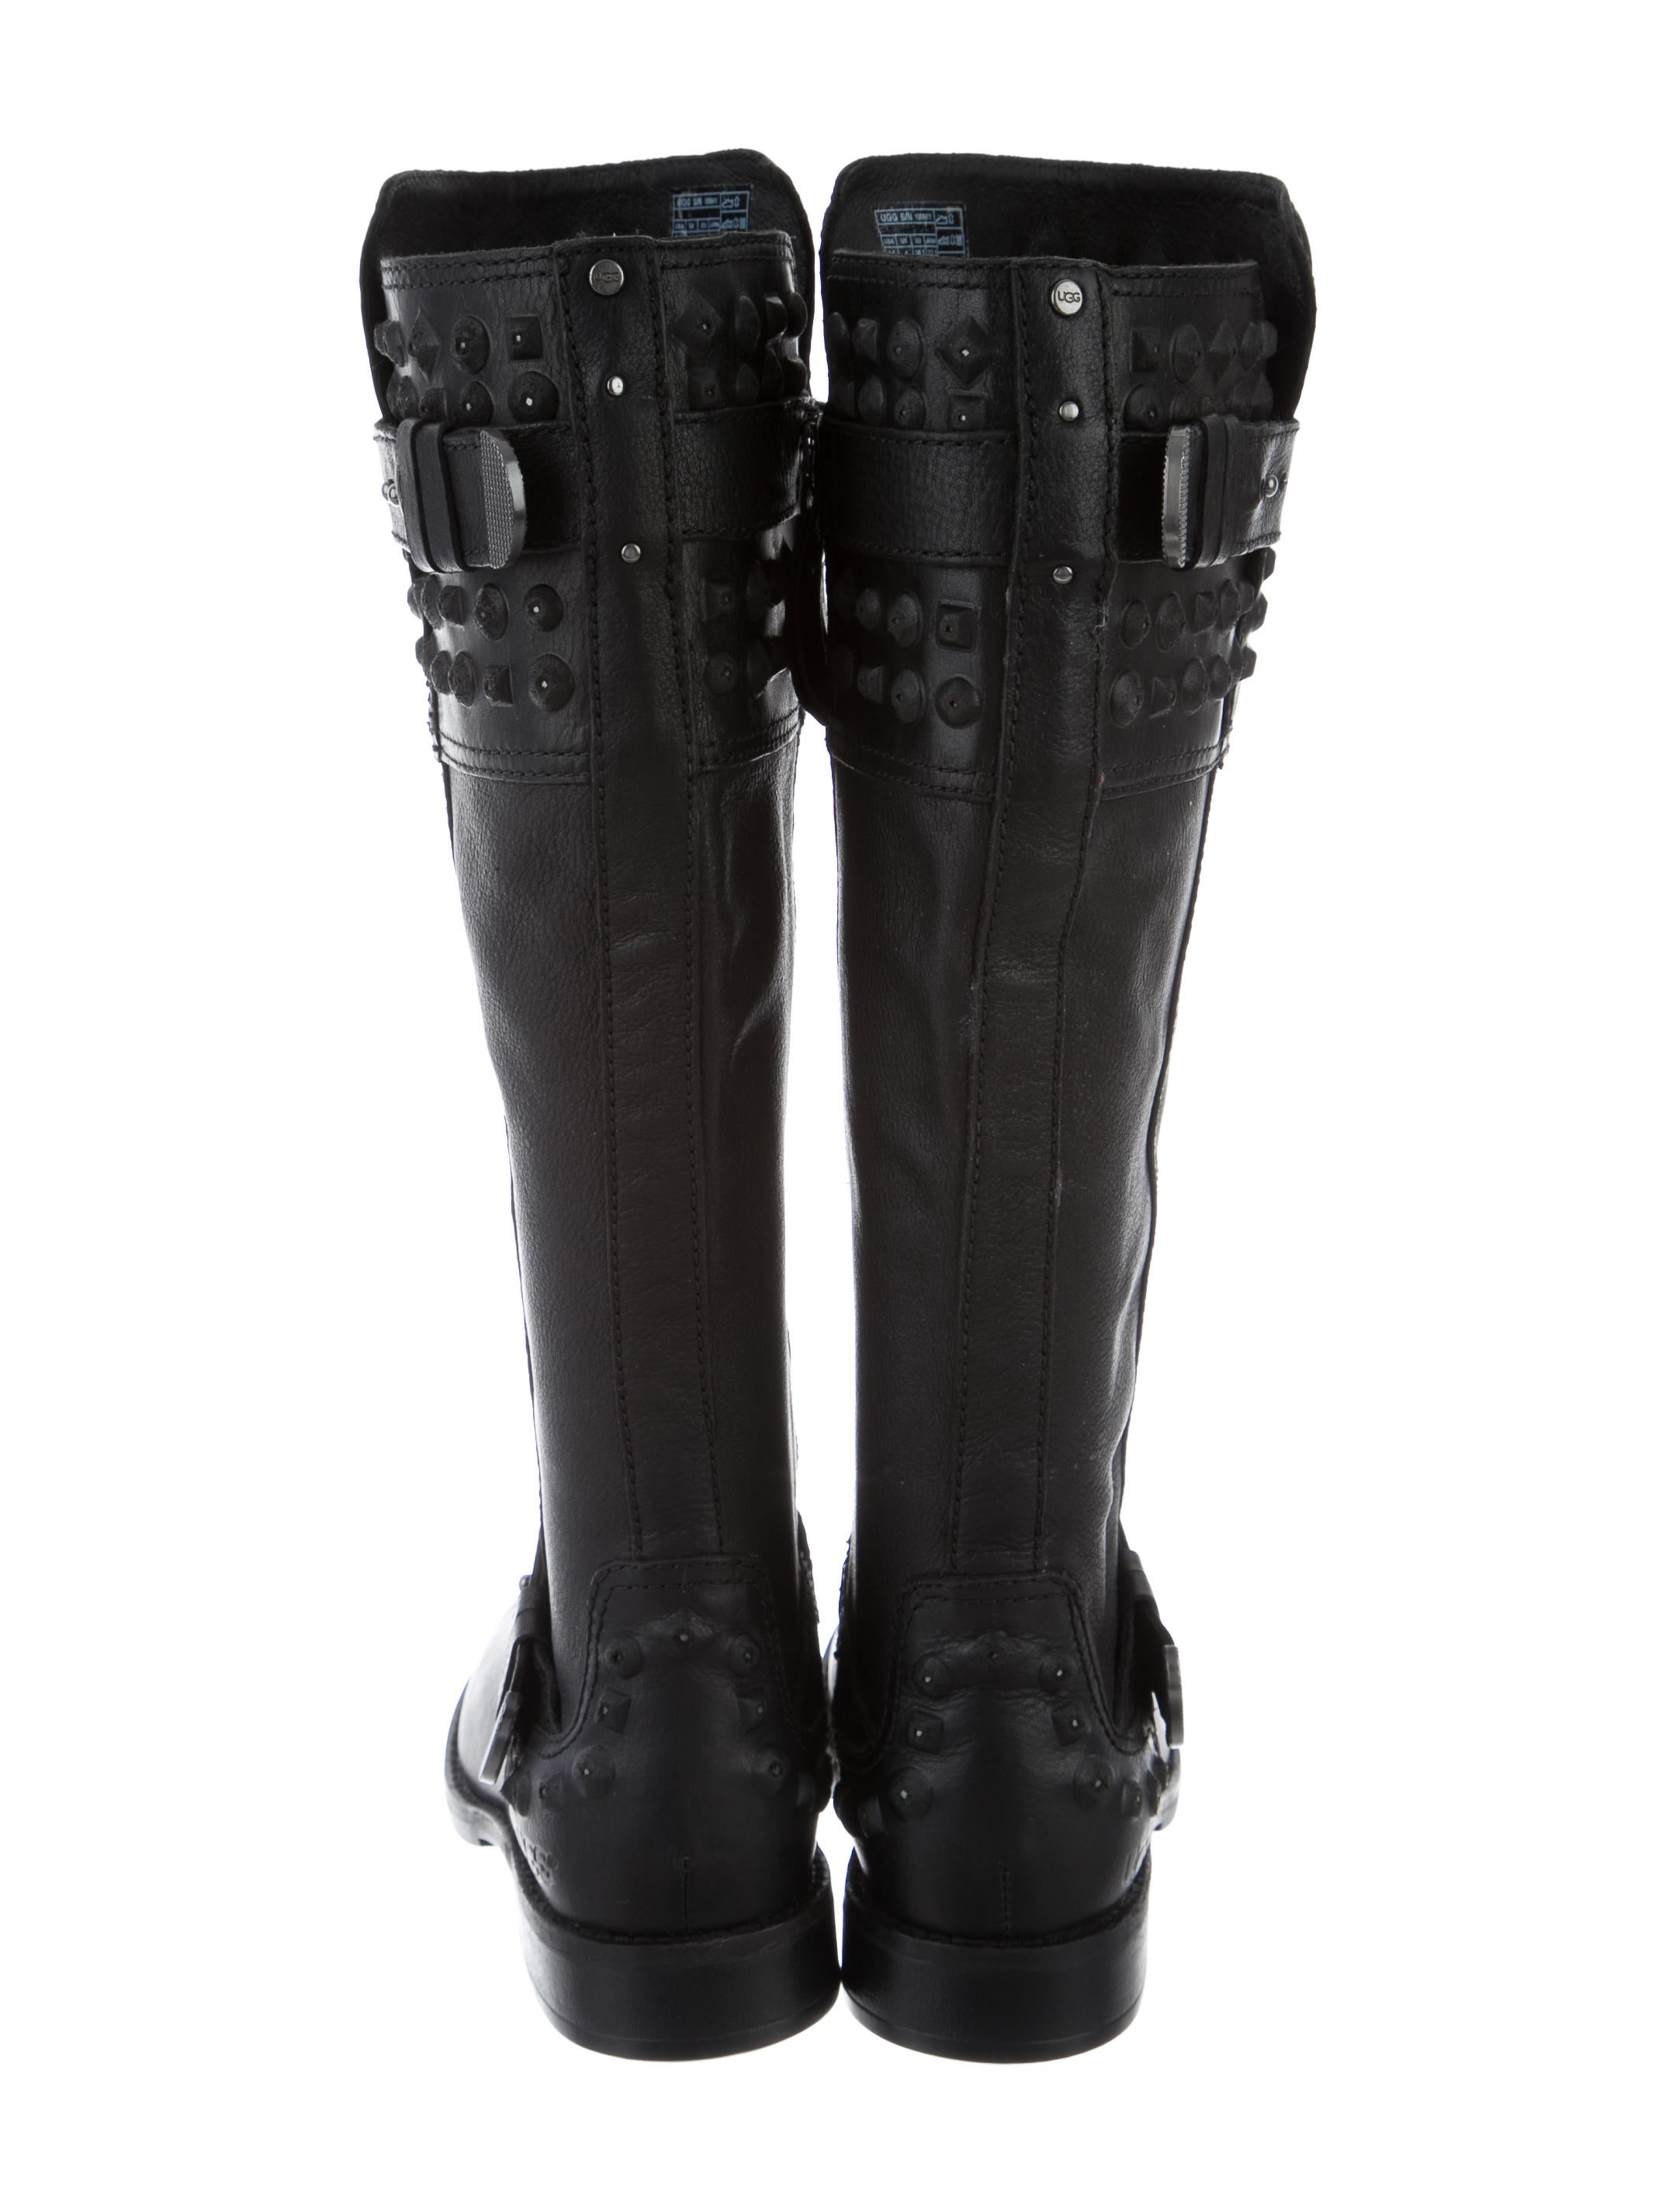 ugg australia studded knee high boots shoes wuugg21880